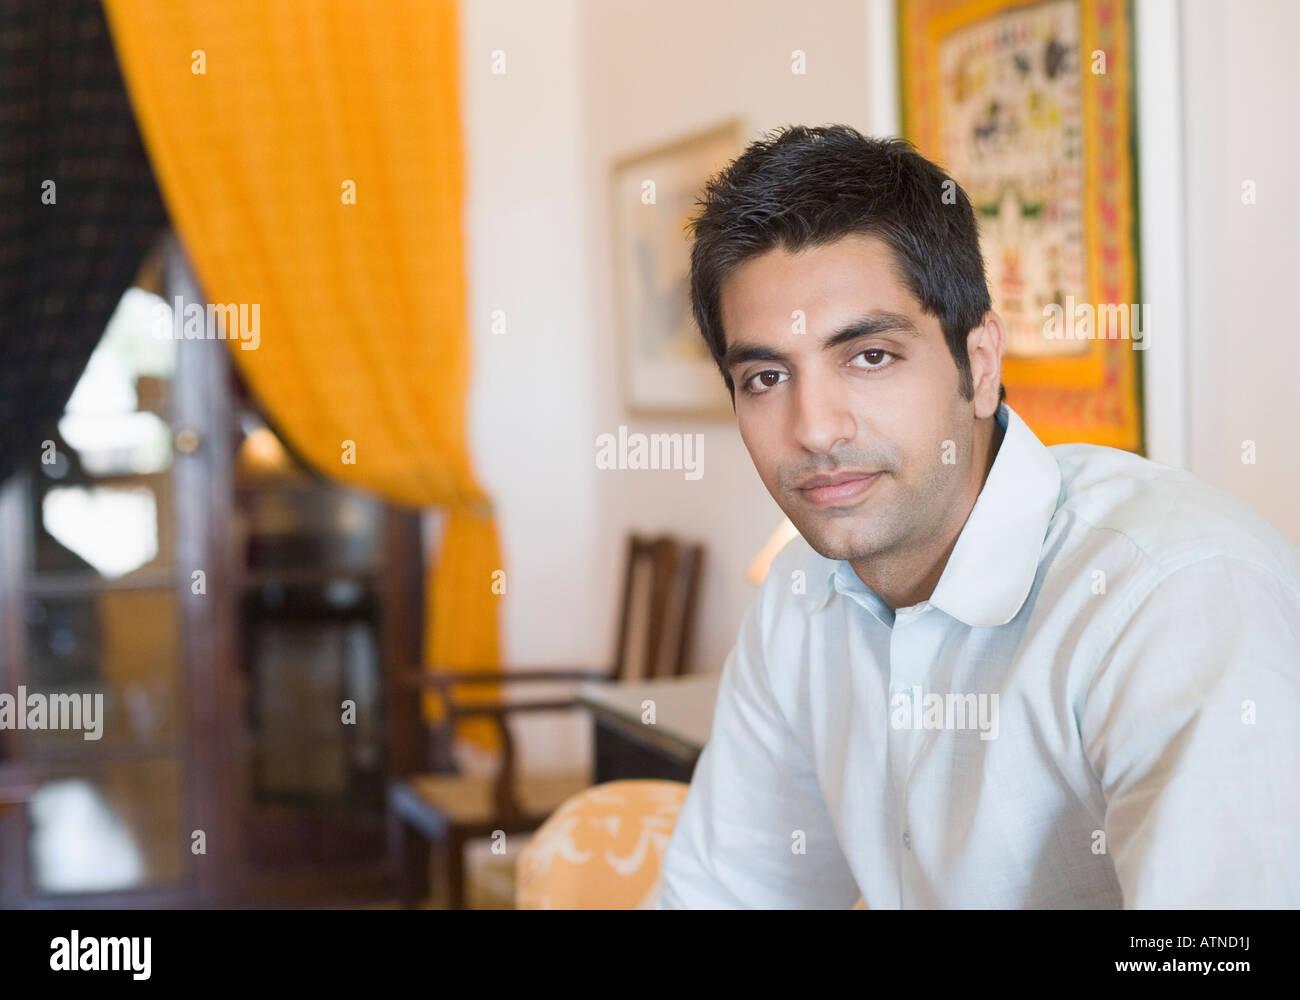 Retrato de un hombre joven Imagen De Stock